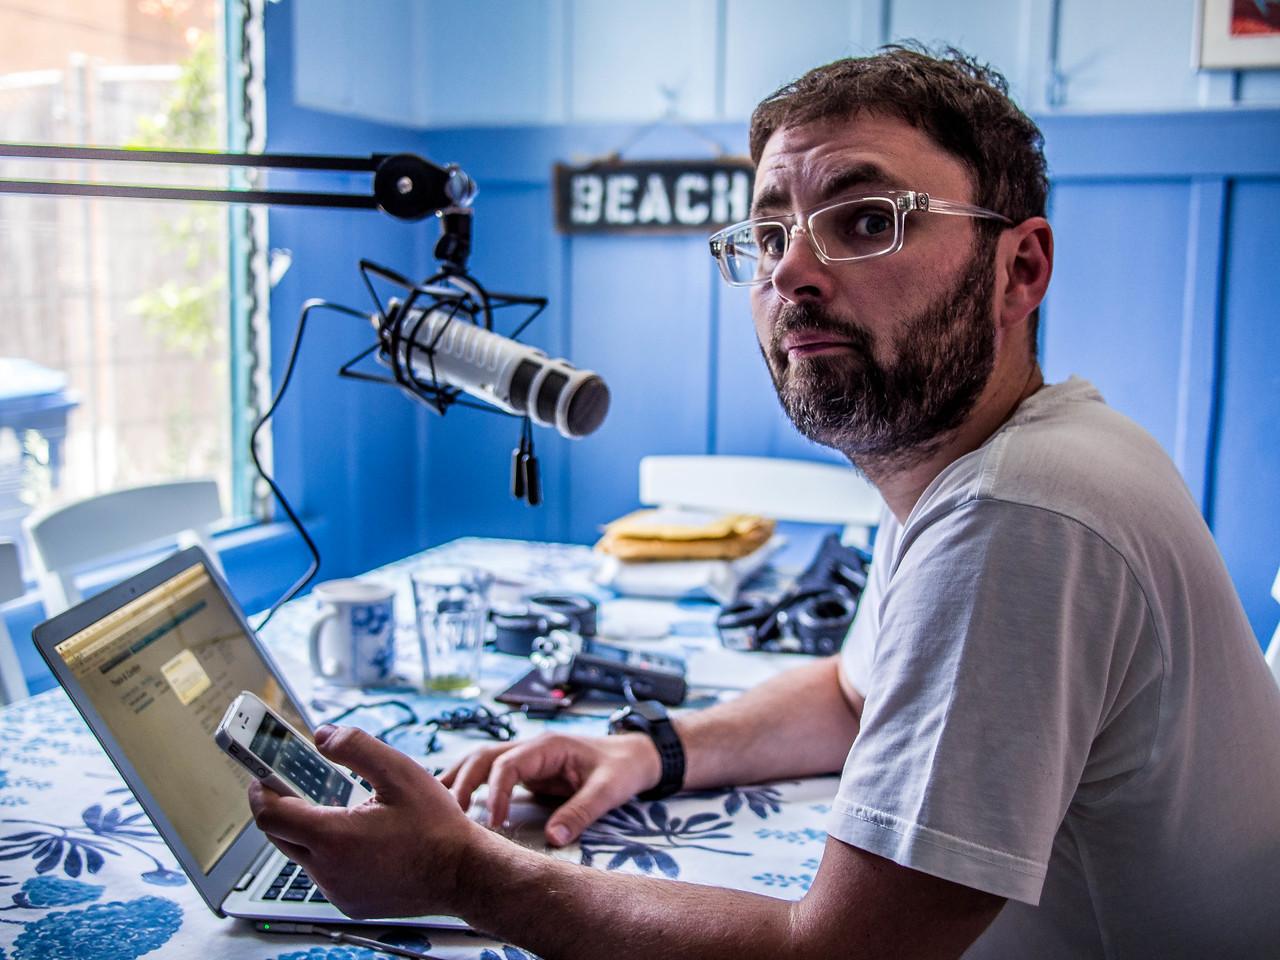 Sergei Klimov records a podcast